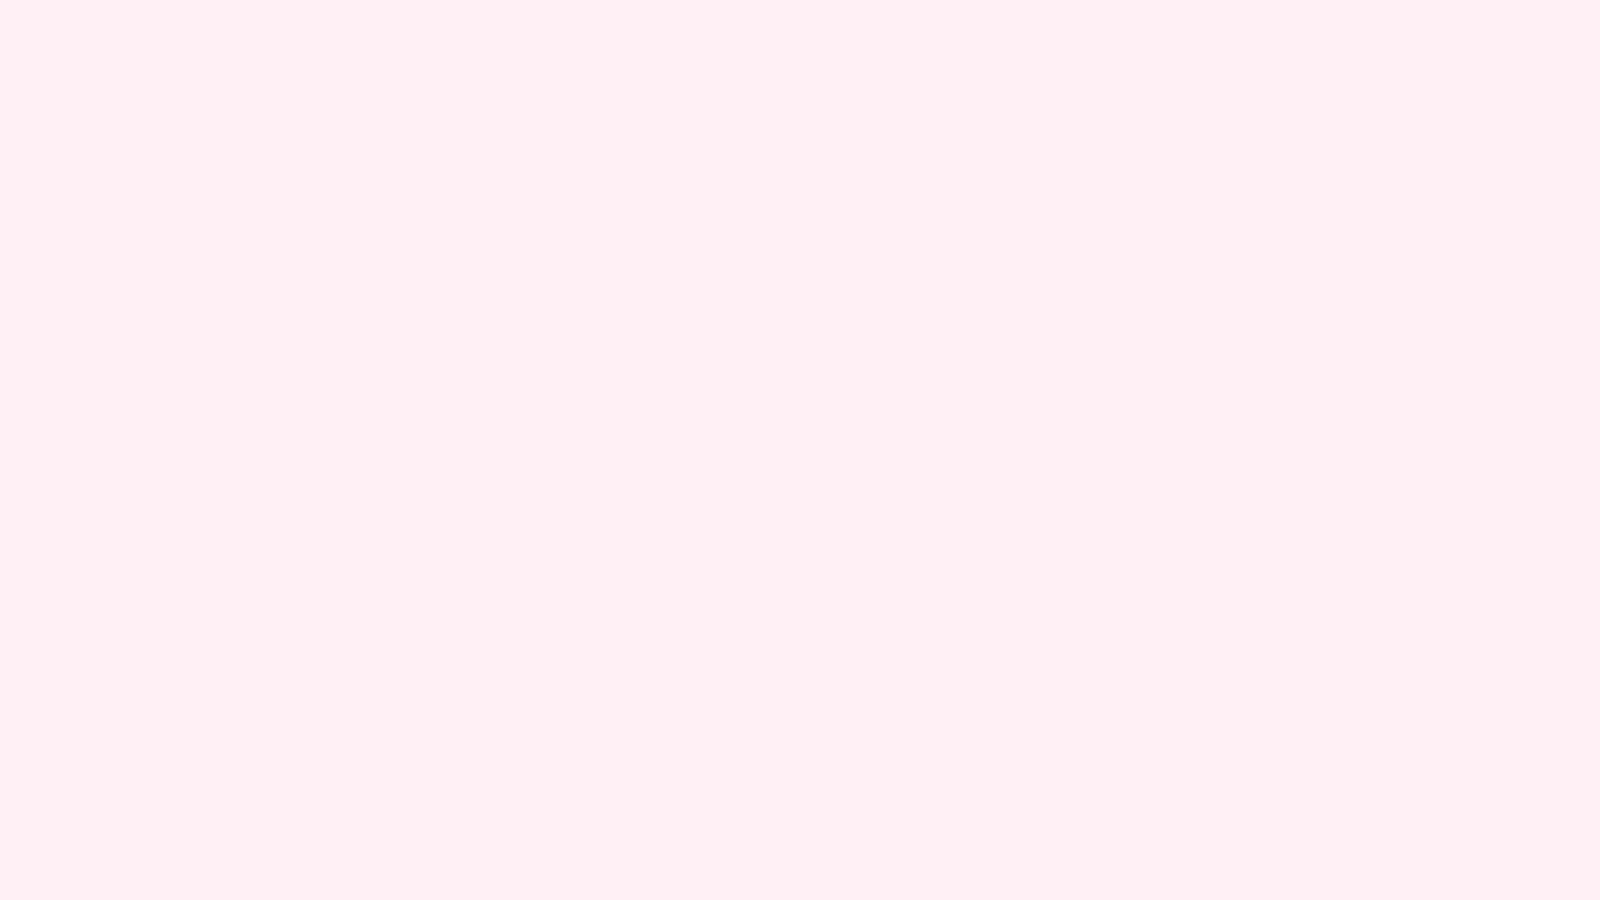 1600x900 Lavender Blush Solid Color Background